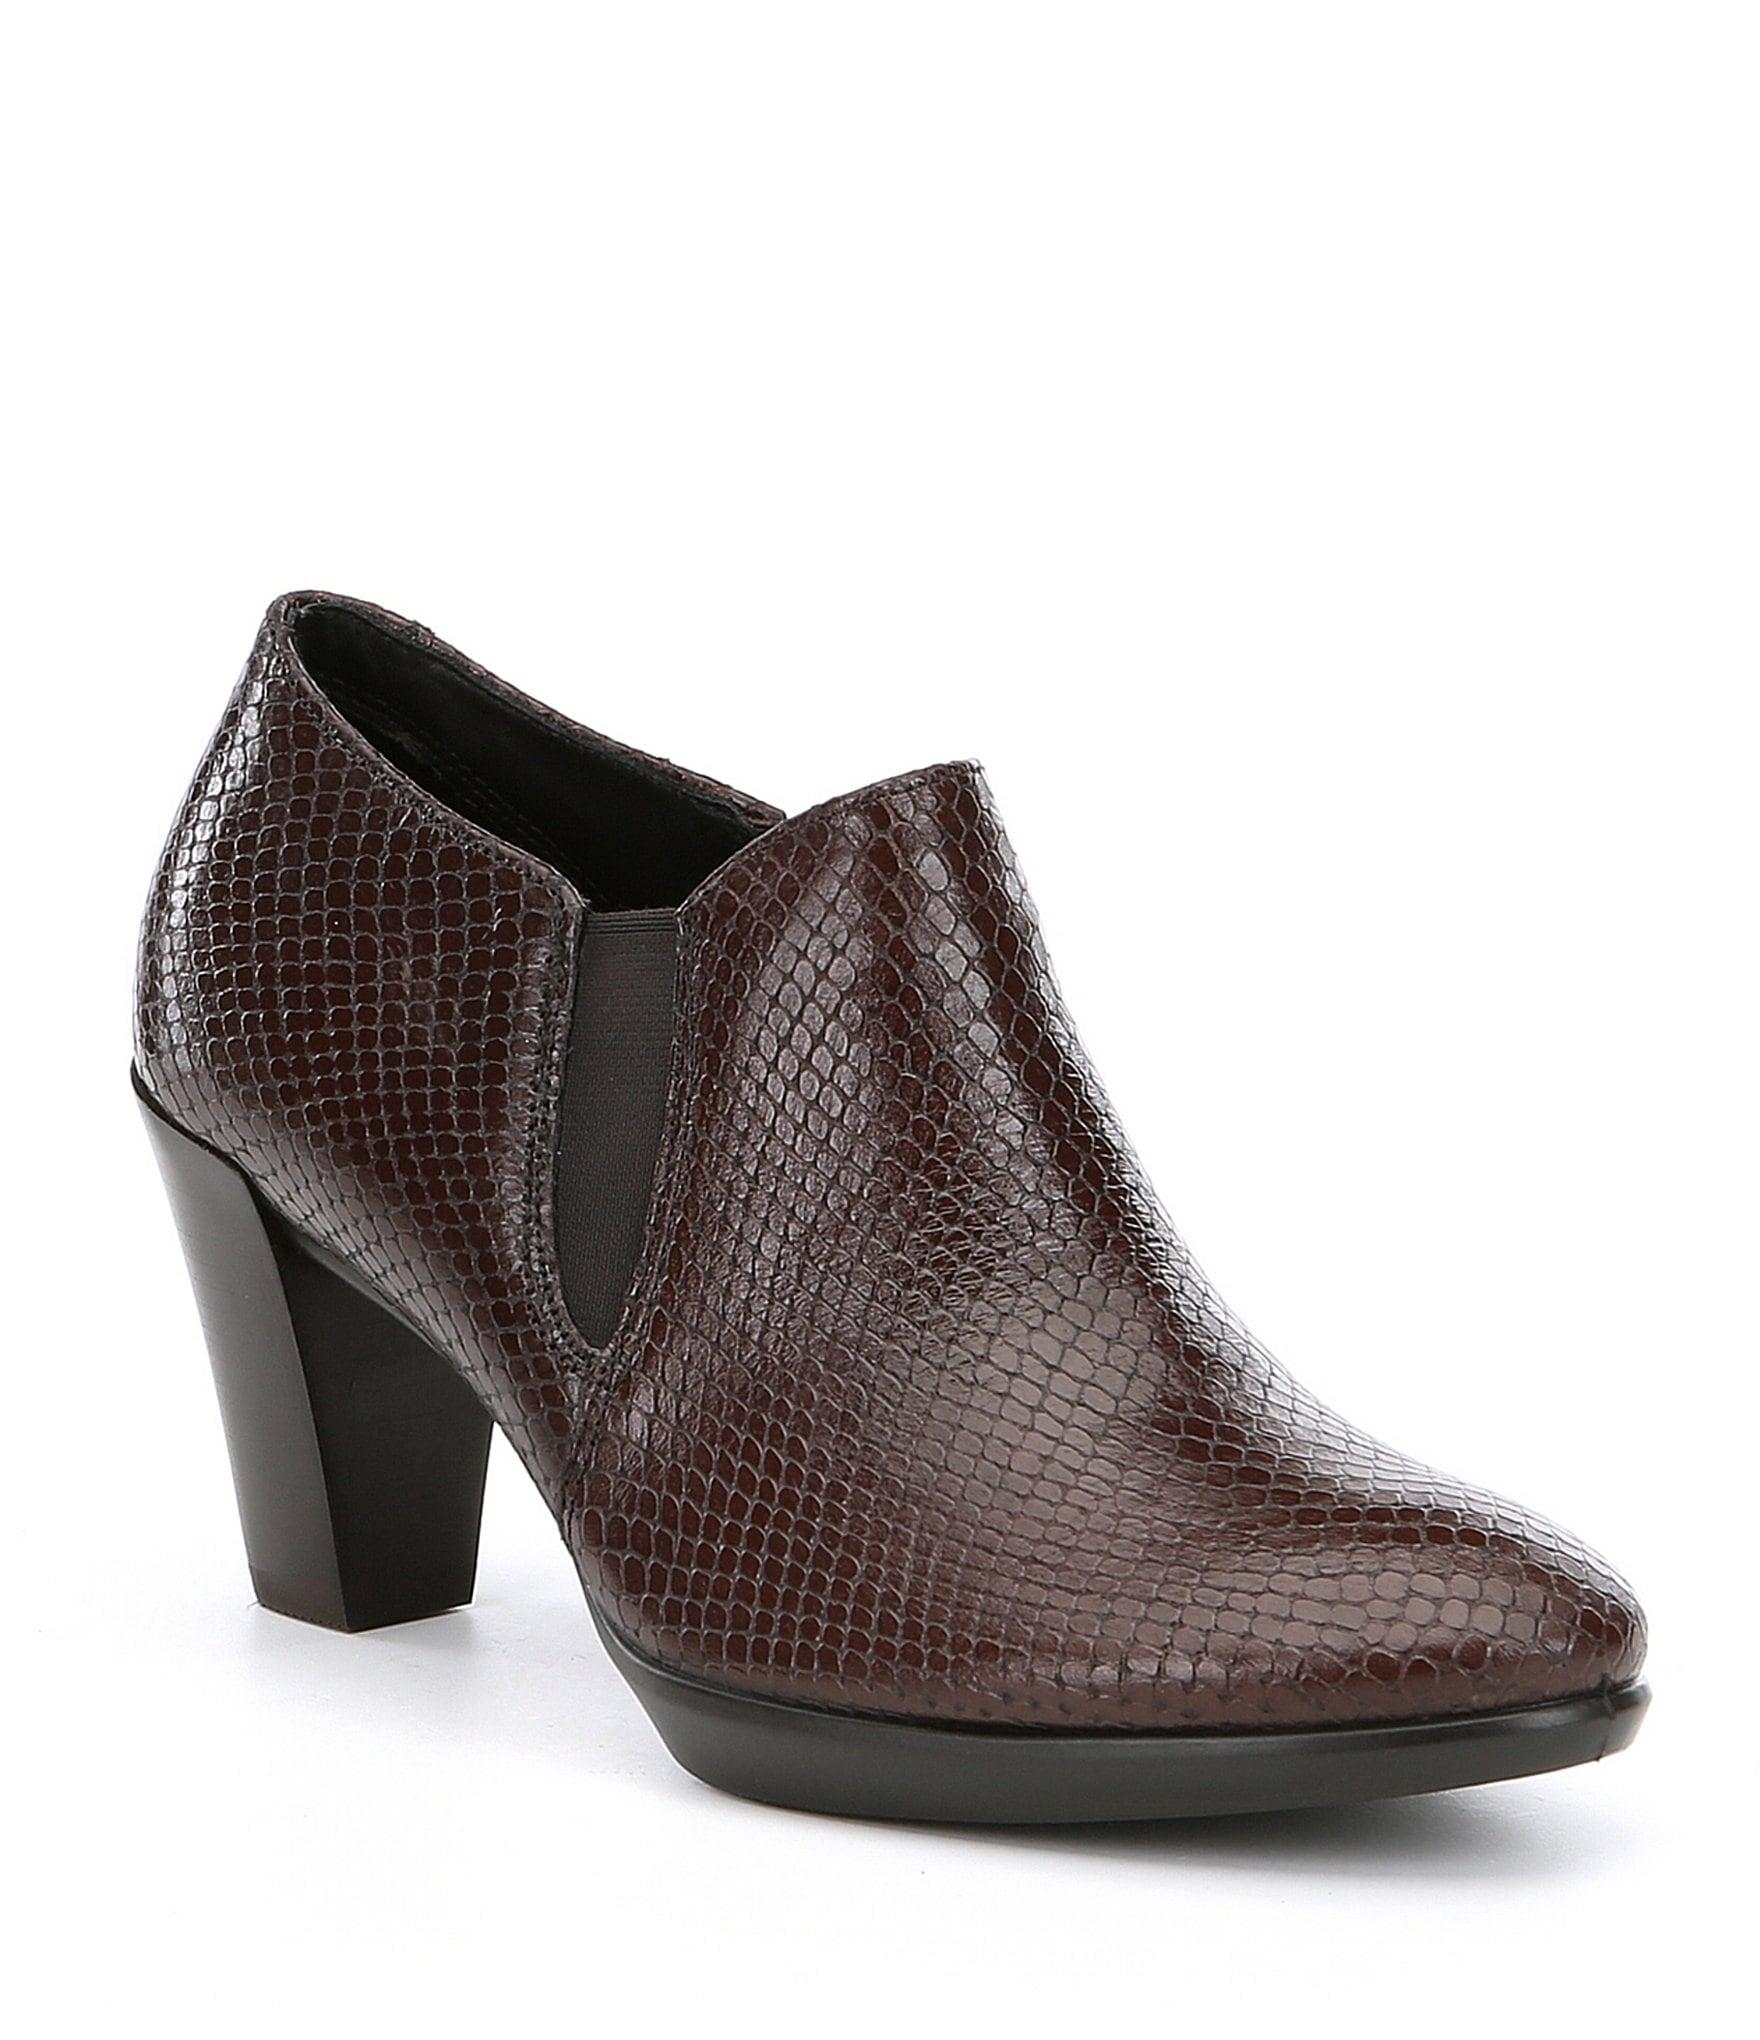 ecco non slip shoes for sale   OFF61% Discounts ae0b5938b